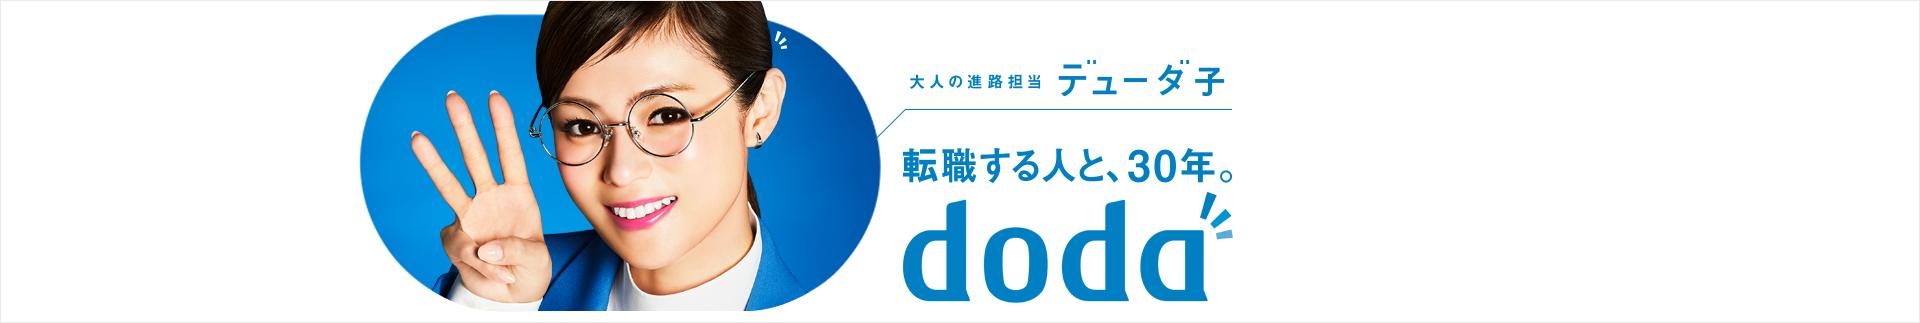 doda転職フェアに出展します